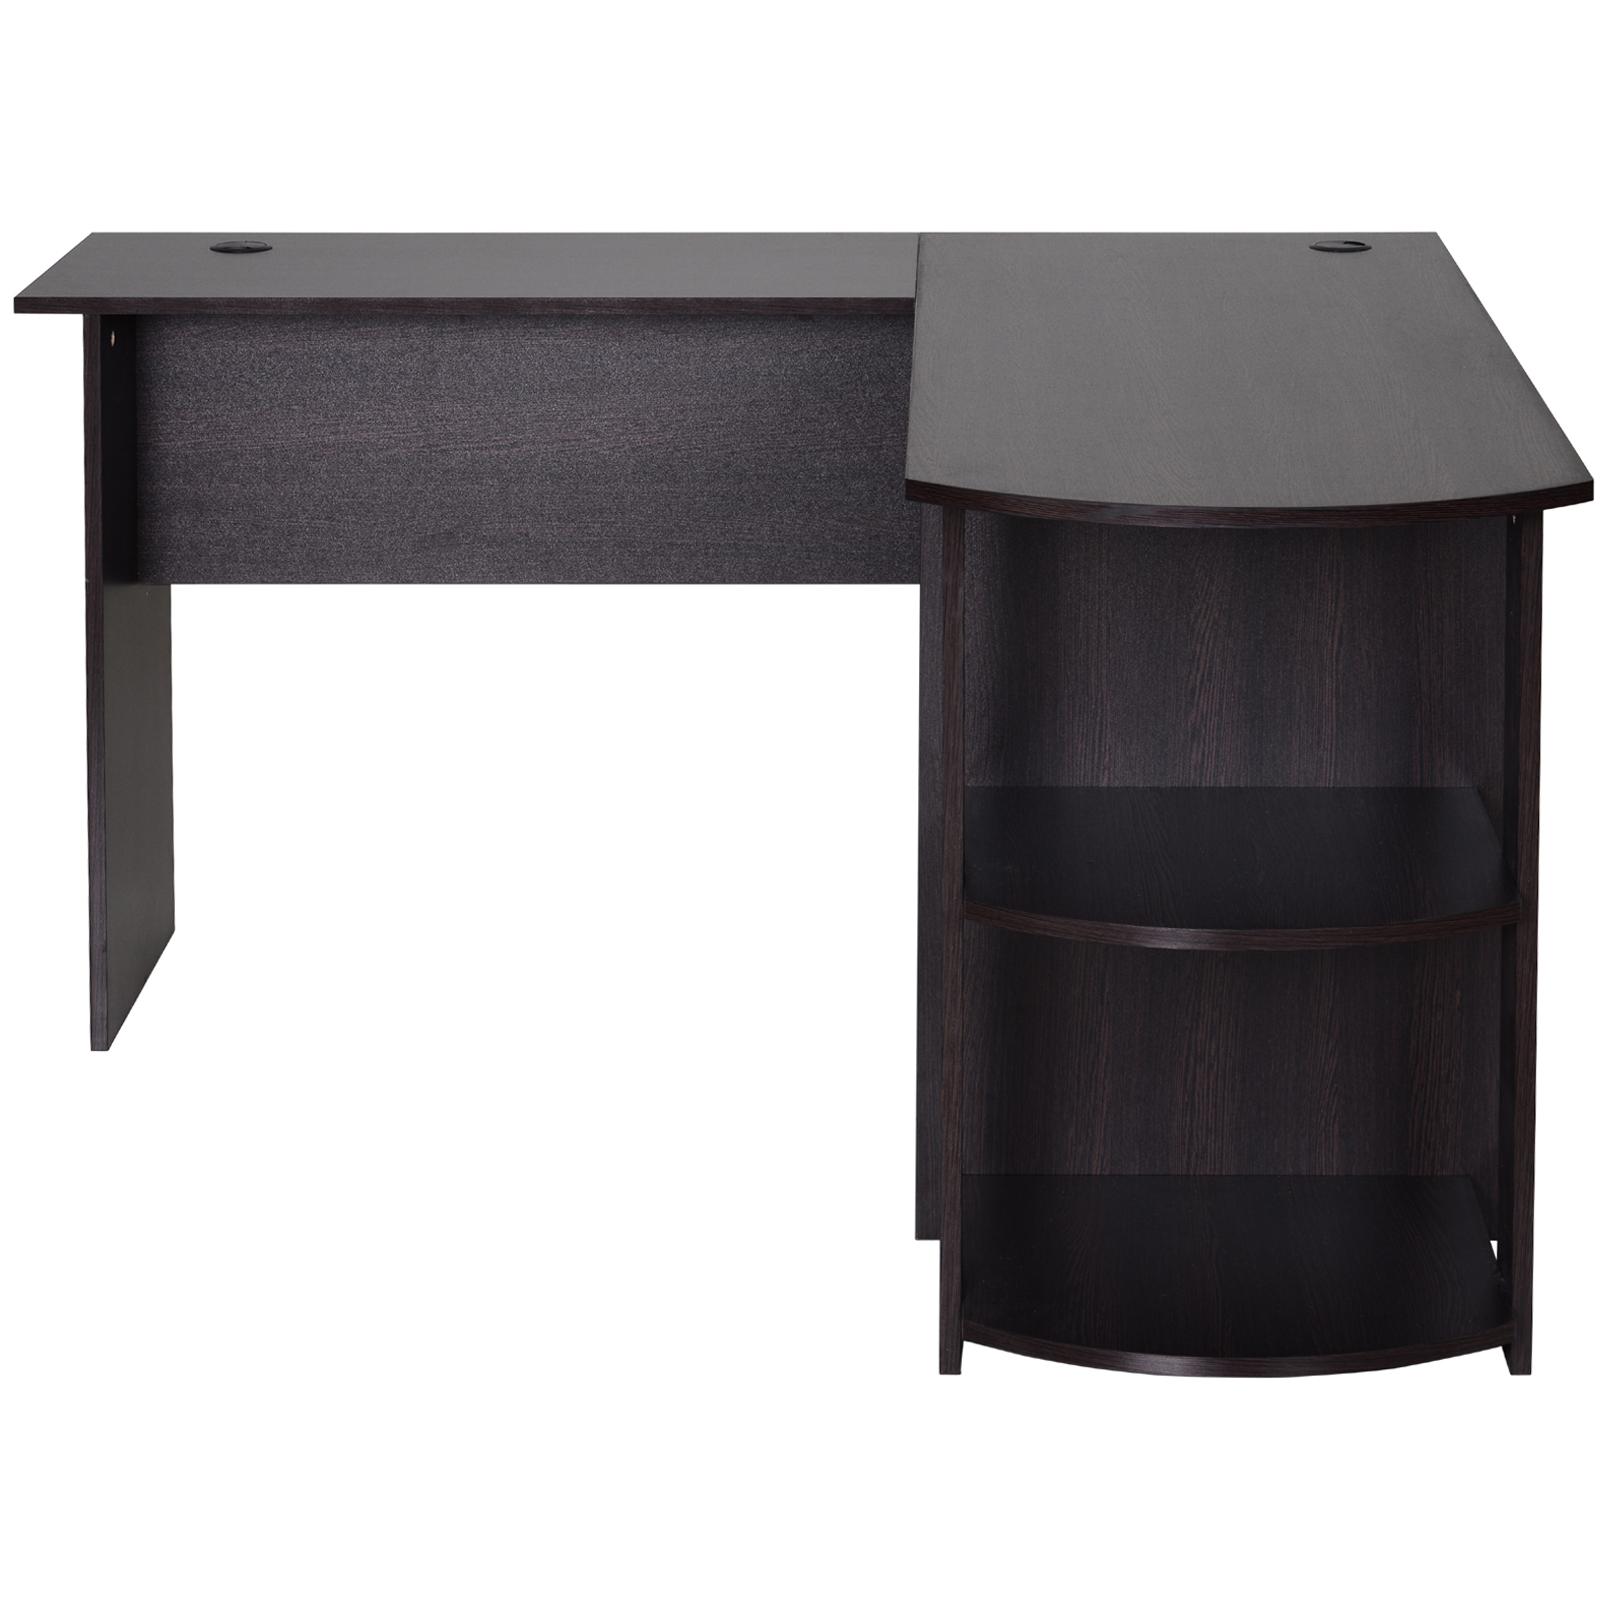 Mesa-de-Ordenador-PC-Escritorio-para-Oficina-Hogar-Esquinera-Forma-L-Madera miniatura 4